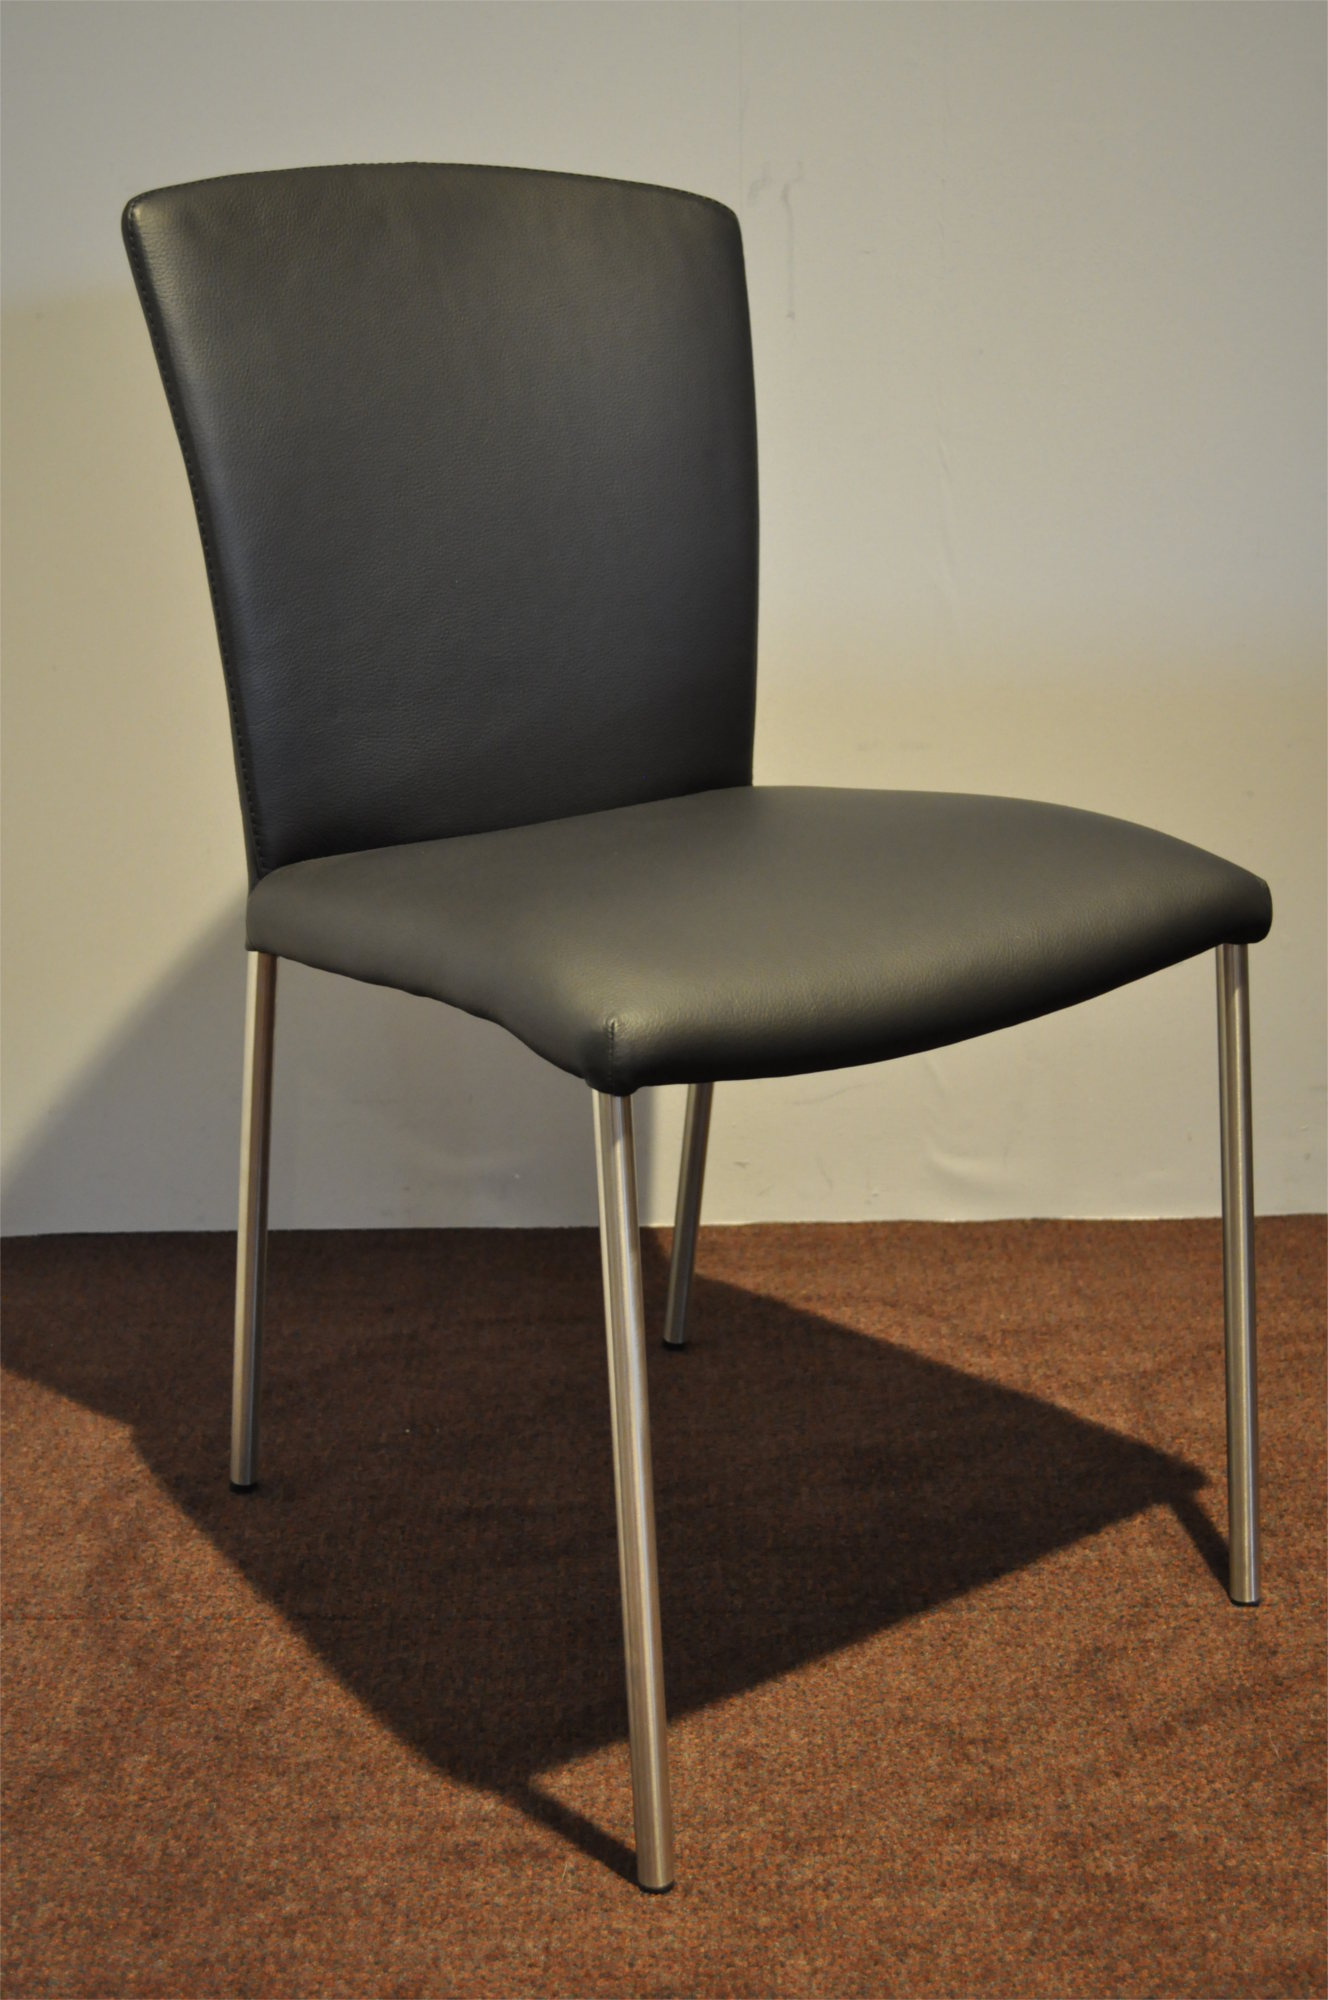 Stuhl 4100 10 6er Set – Contur – Stühle – Günstig Kaufen